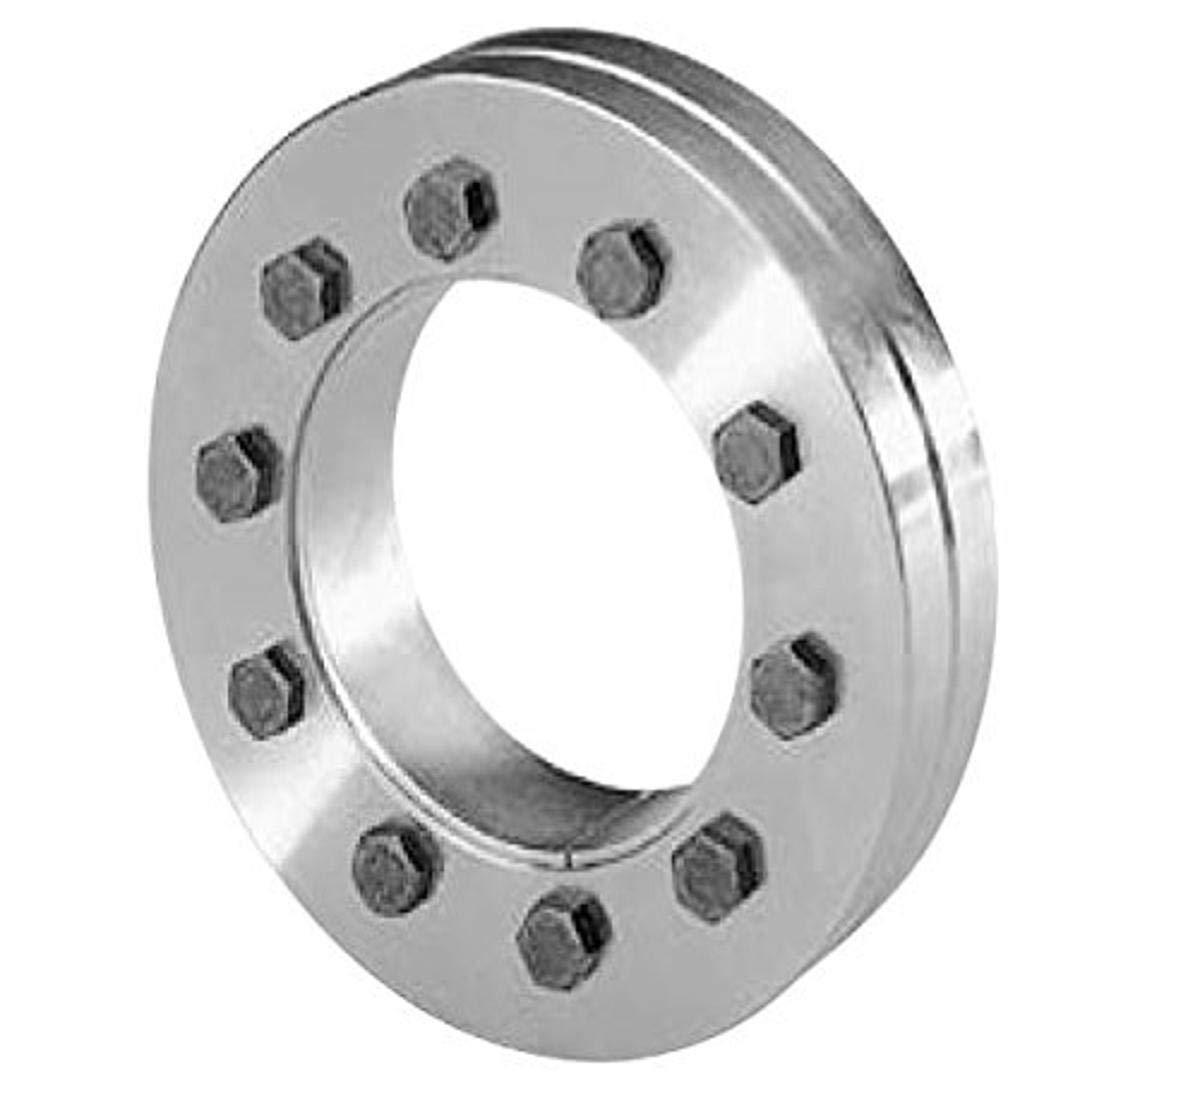 Lovejoy 900 Series Shaft Locking Device, 44 mm (1.732